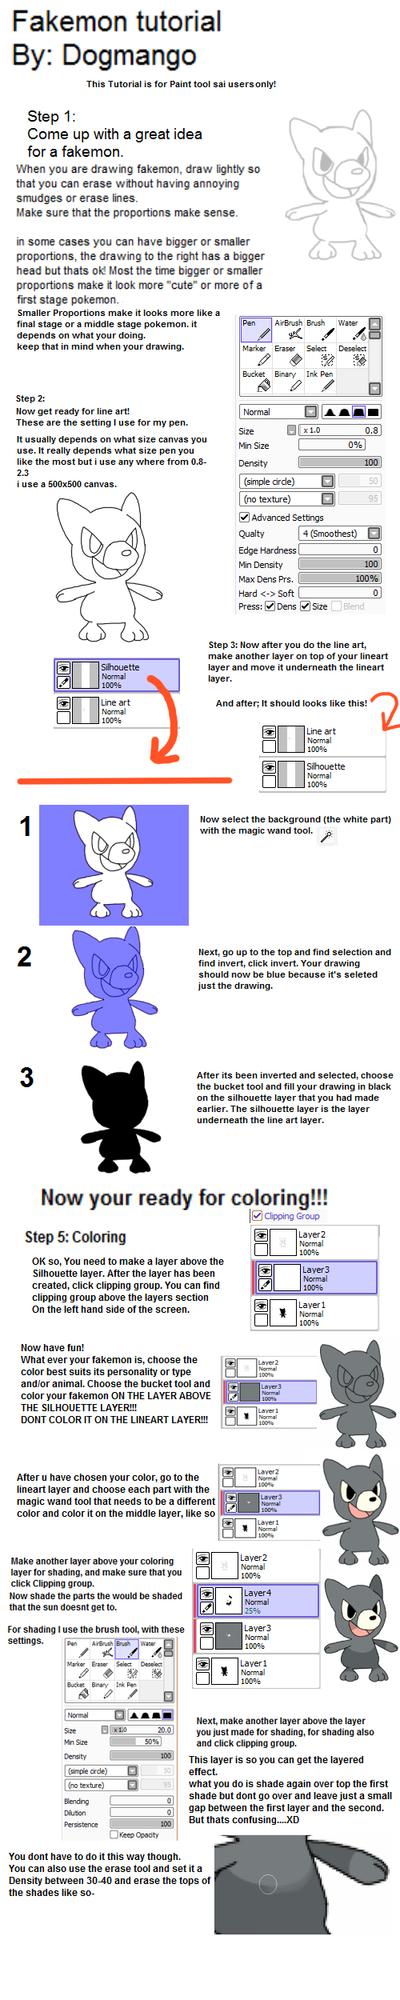 Fakemon Tutorial Part 1 by DogMango